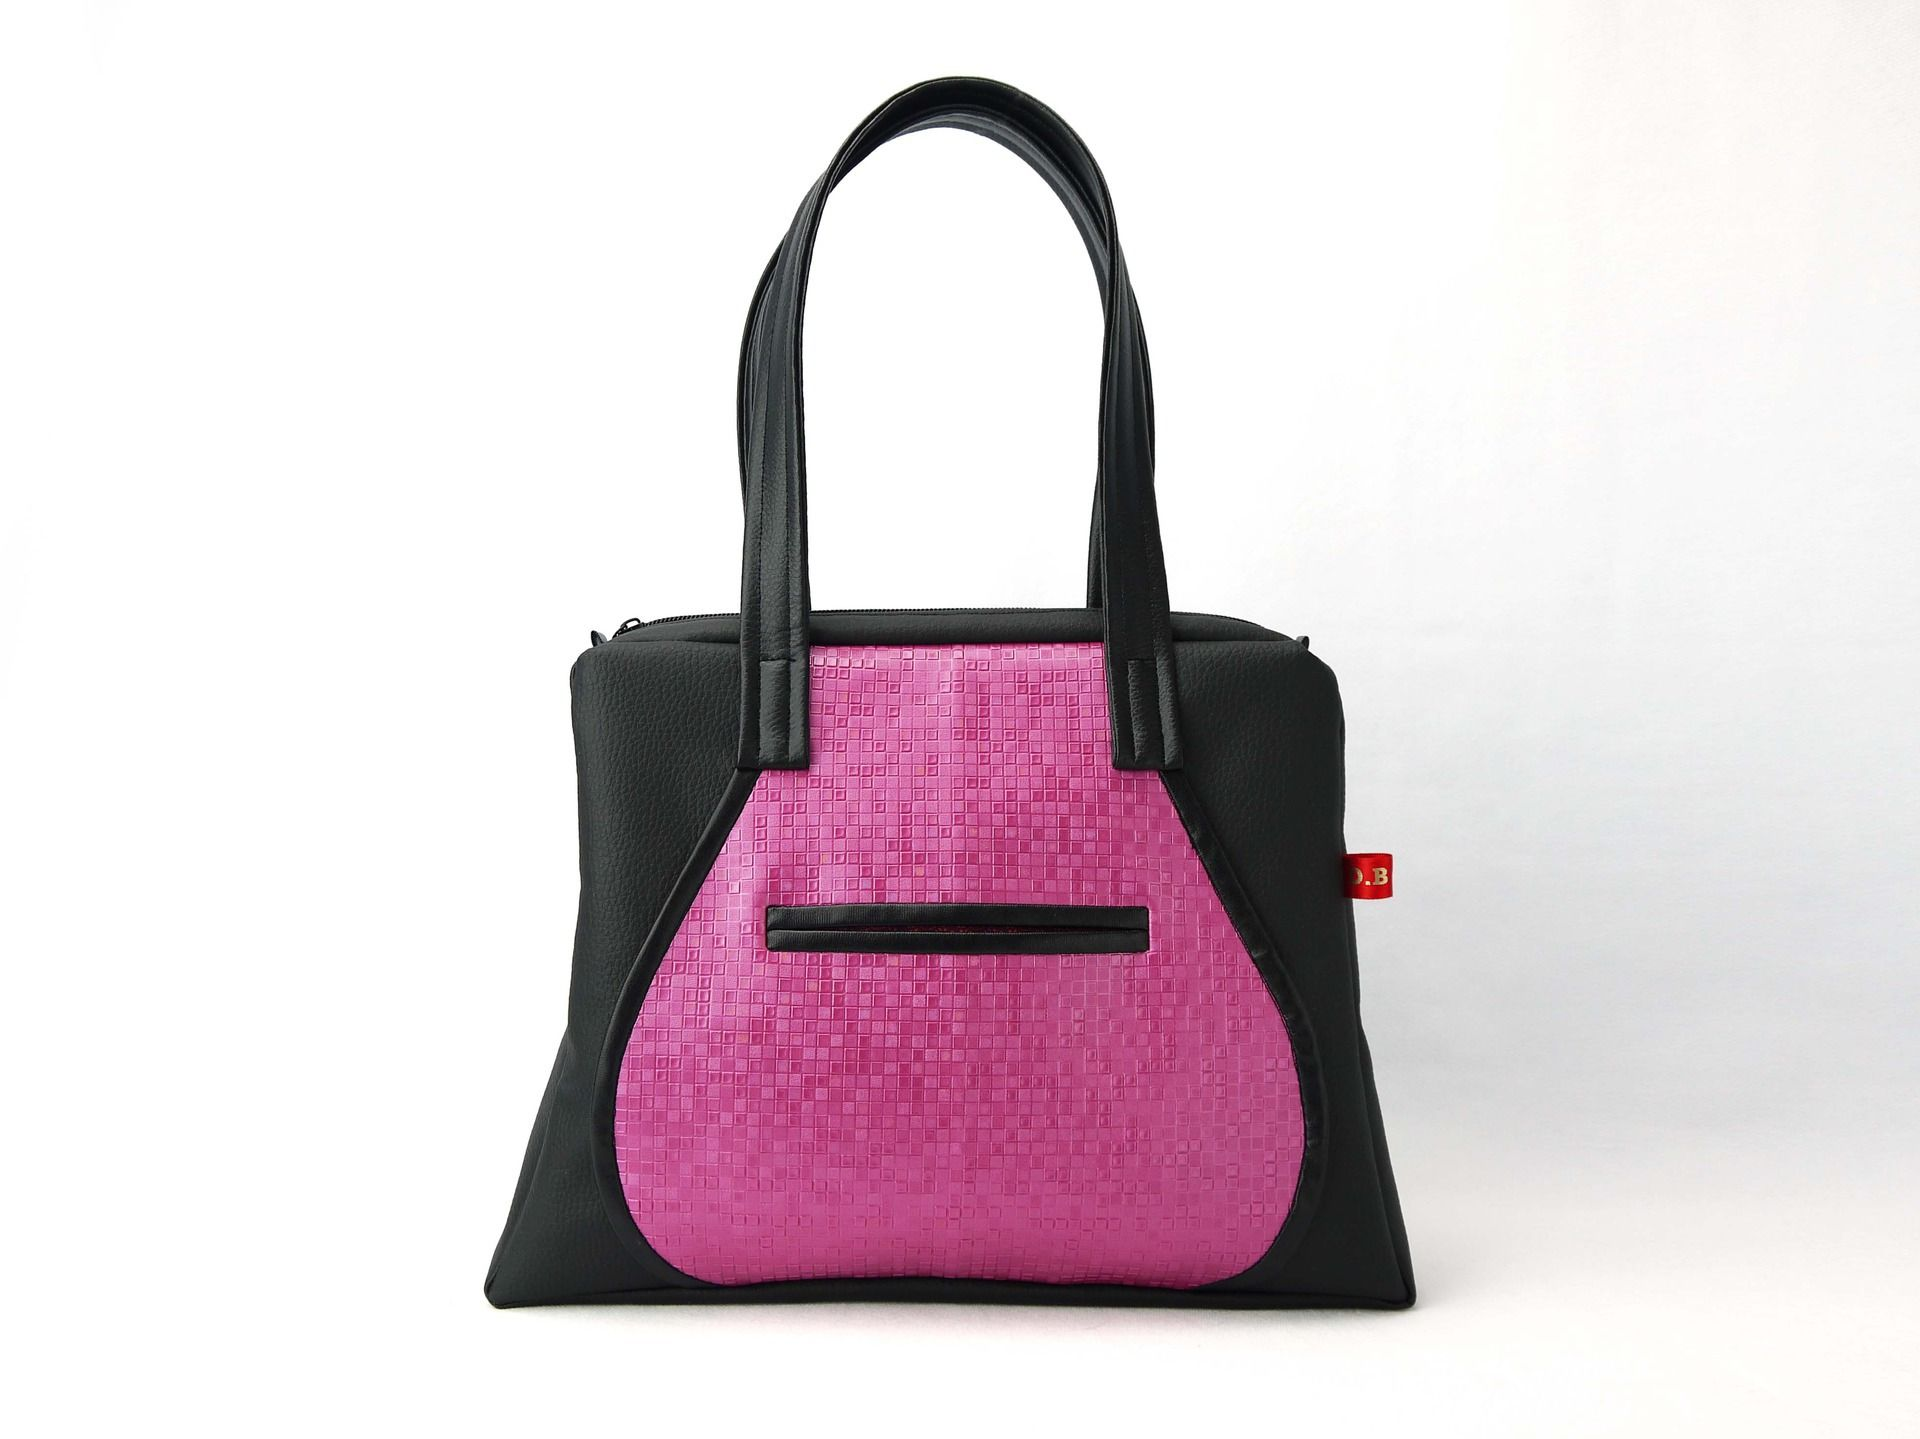 Fond de sac à main Eve - noir 5Ld1K